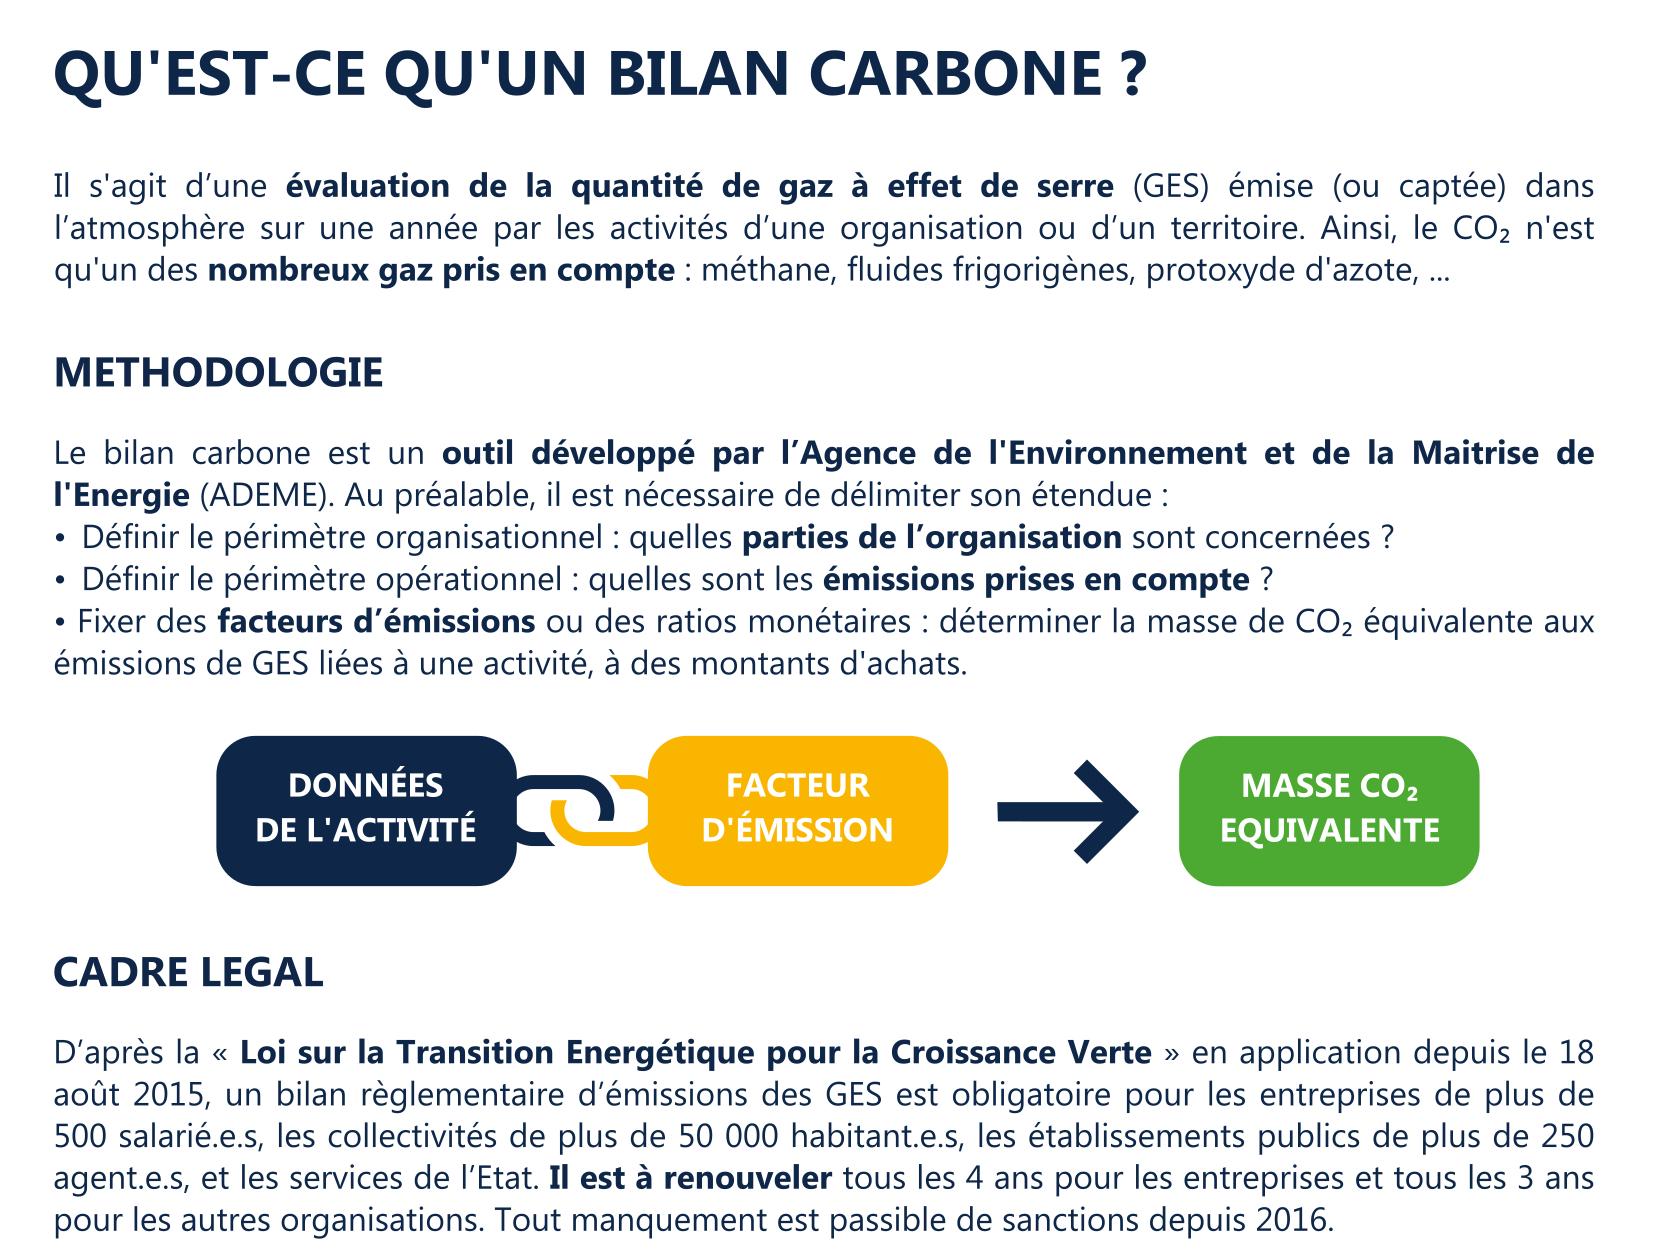 Explication bilan carbone